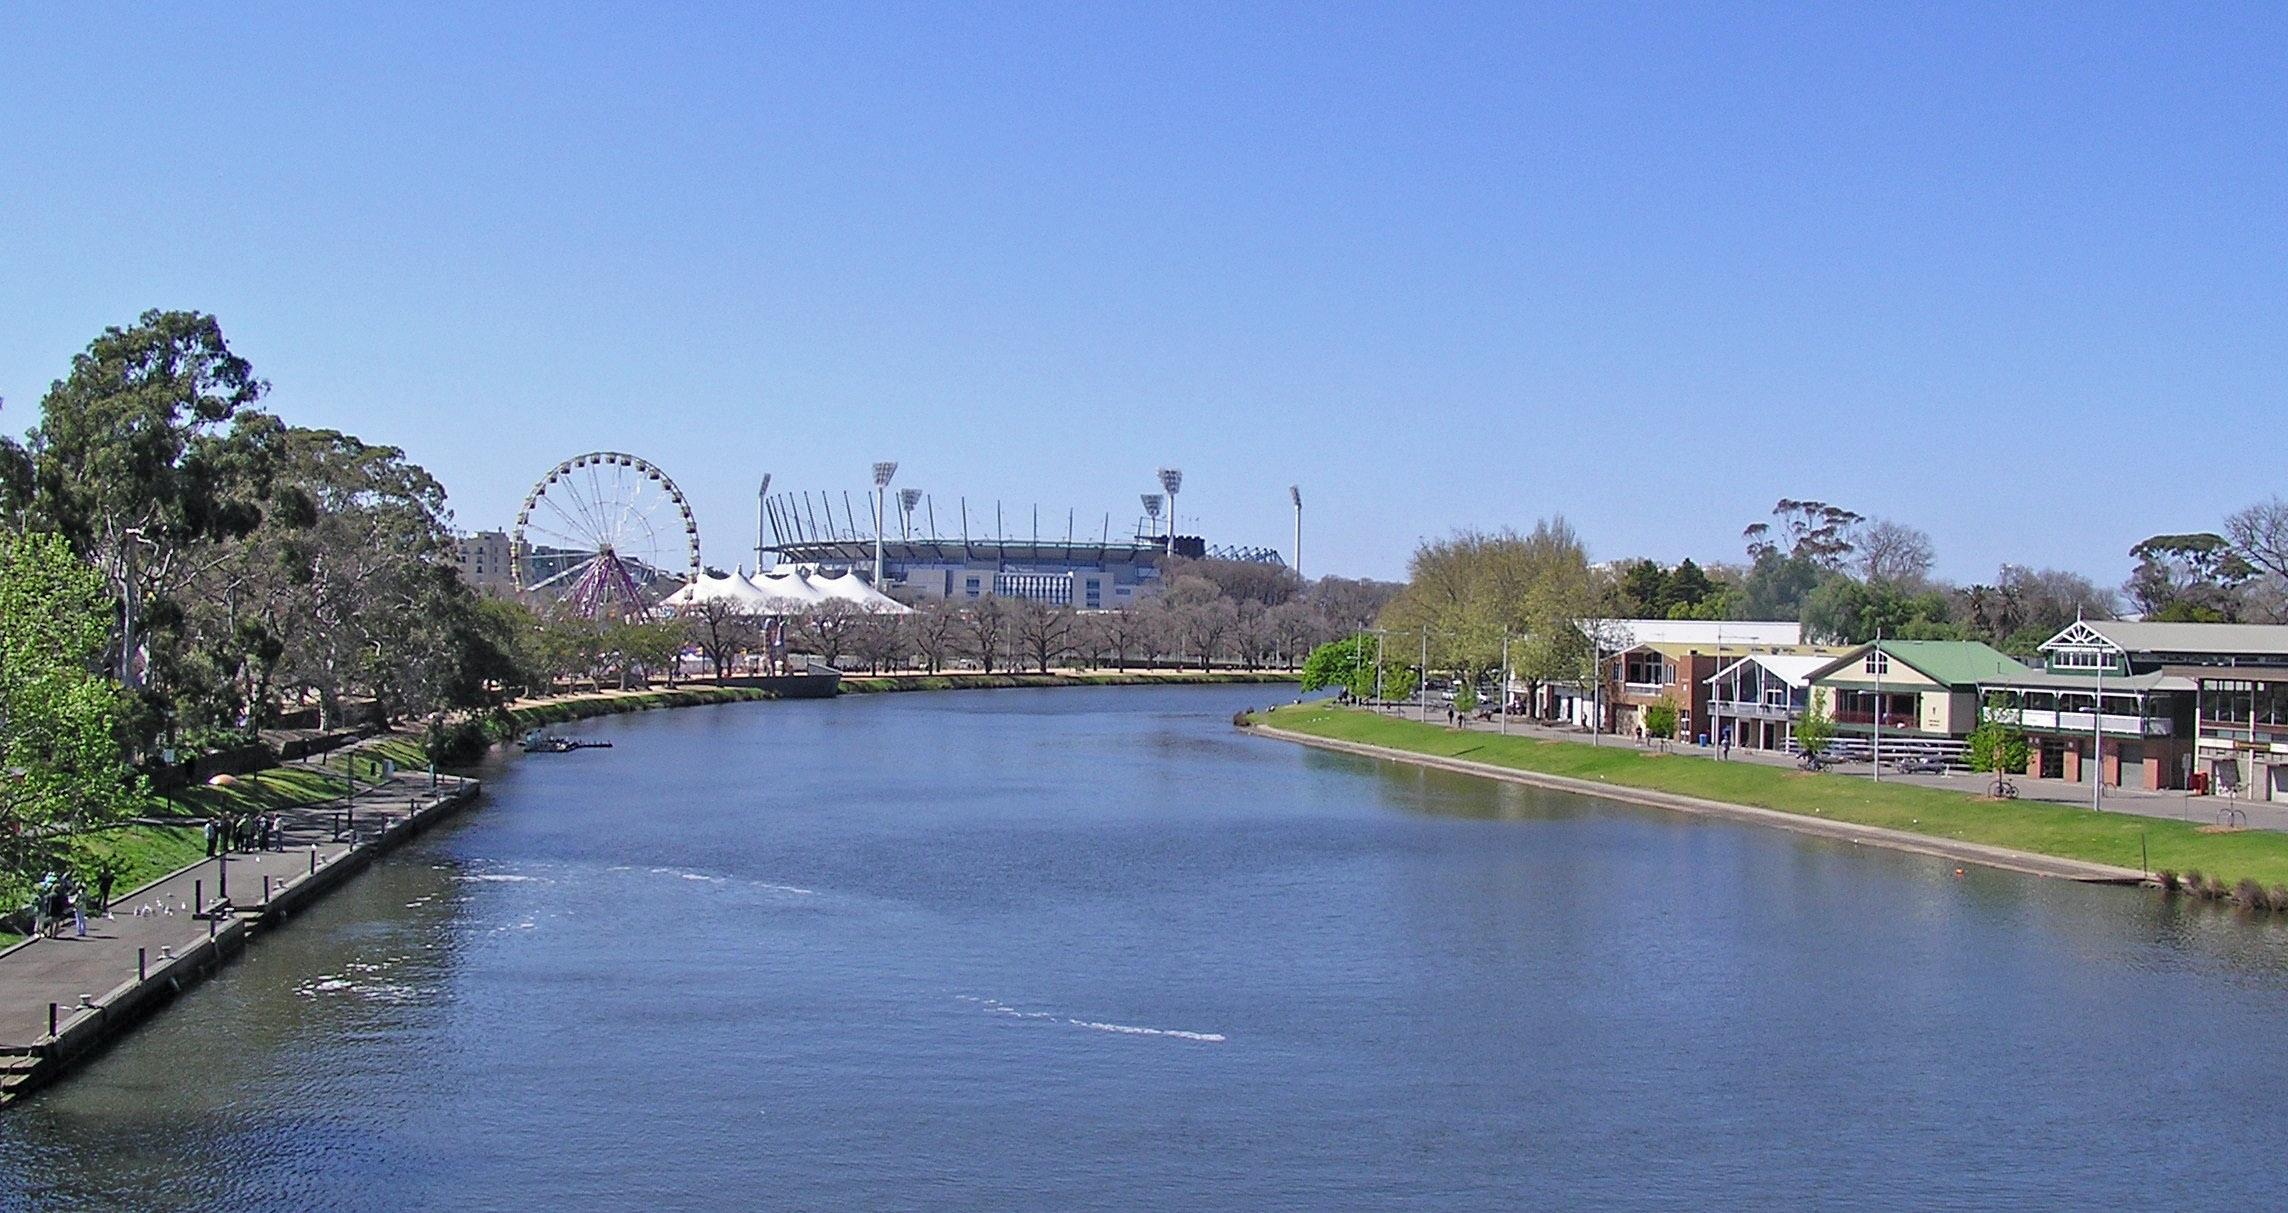 Yarra River in Melbourne, Victoria, Australia landscape.